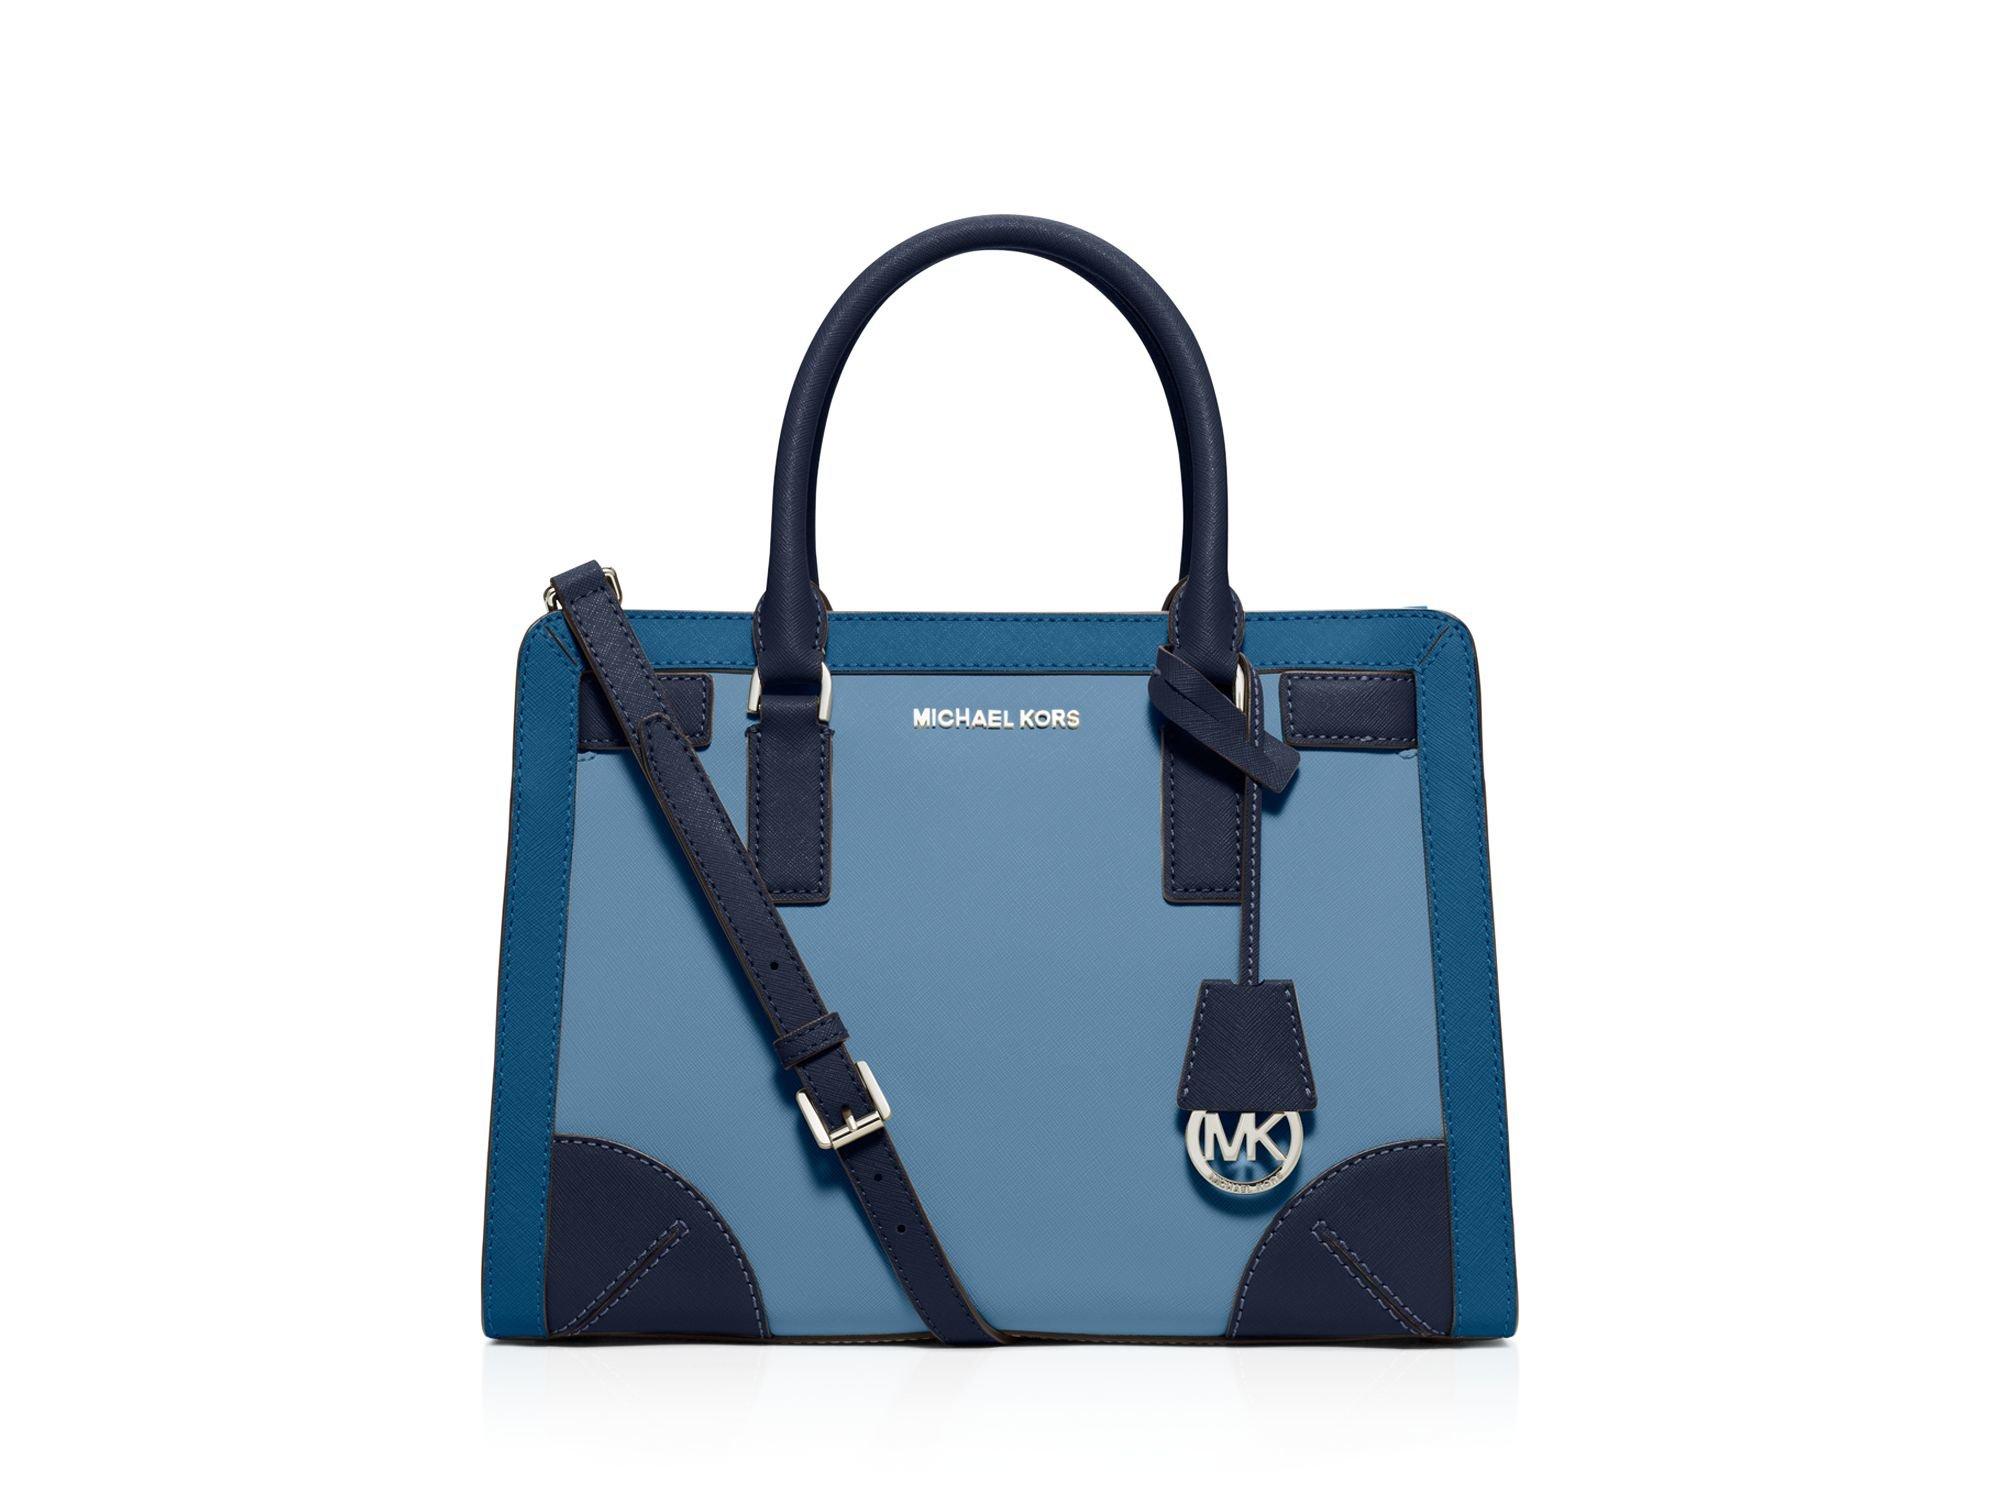 6c5c91f1328c ... Crossbody Handbag michael kors bags india Previously sold at  Bloomingdales · Womens Michael By Michael Kors Dillon .